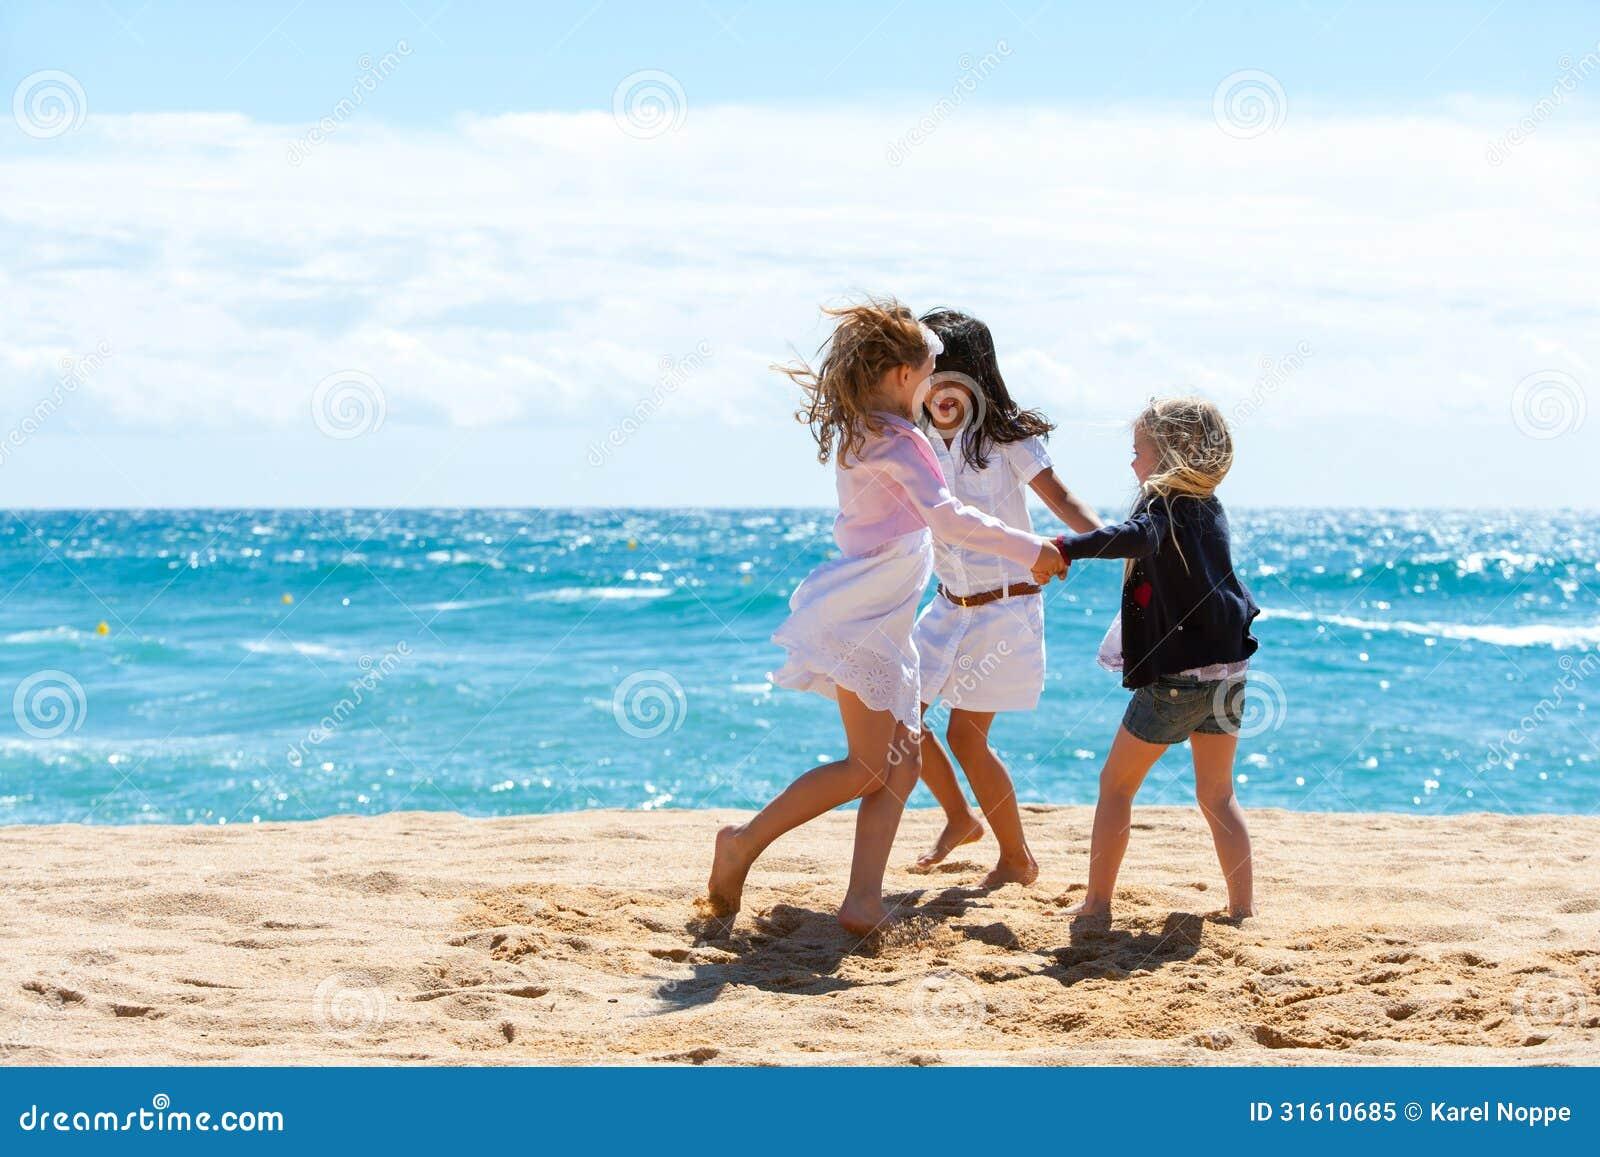 Идеи для детей фото на пляже